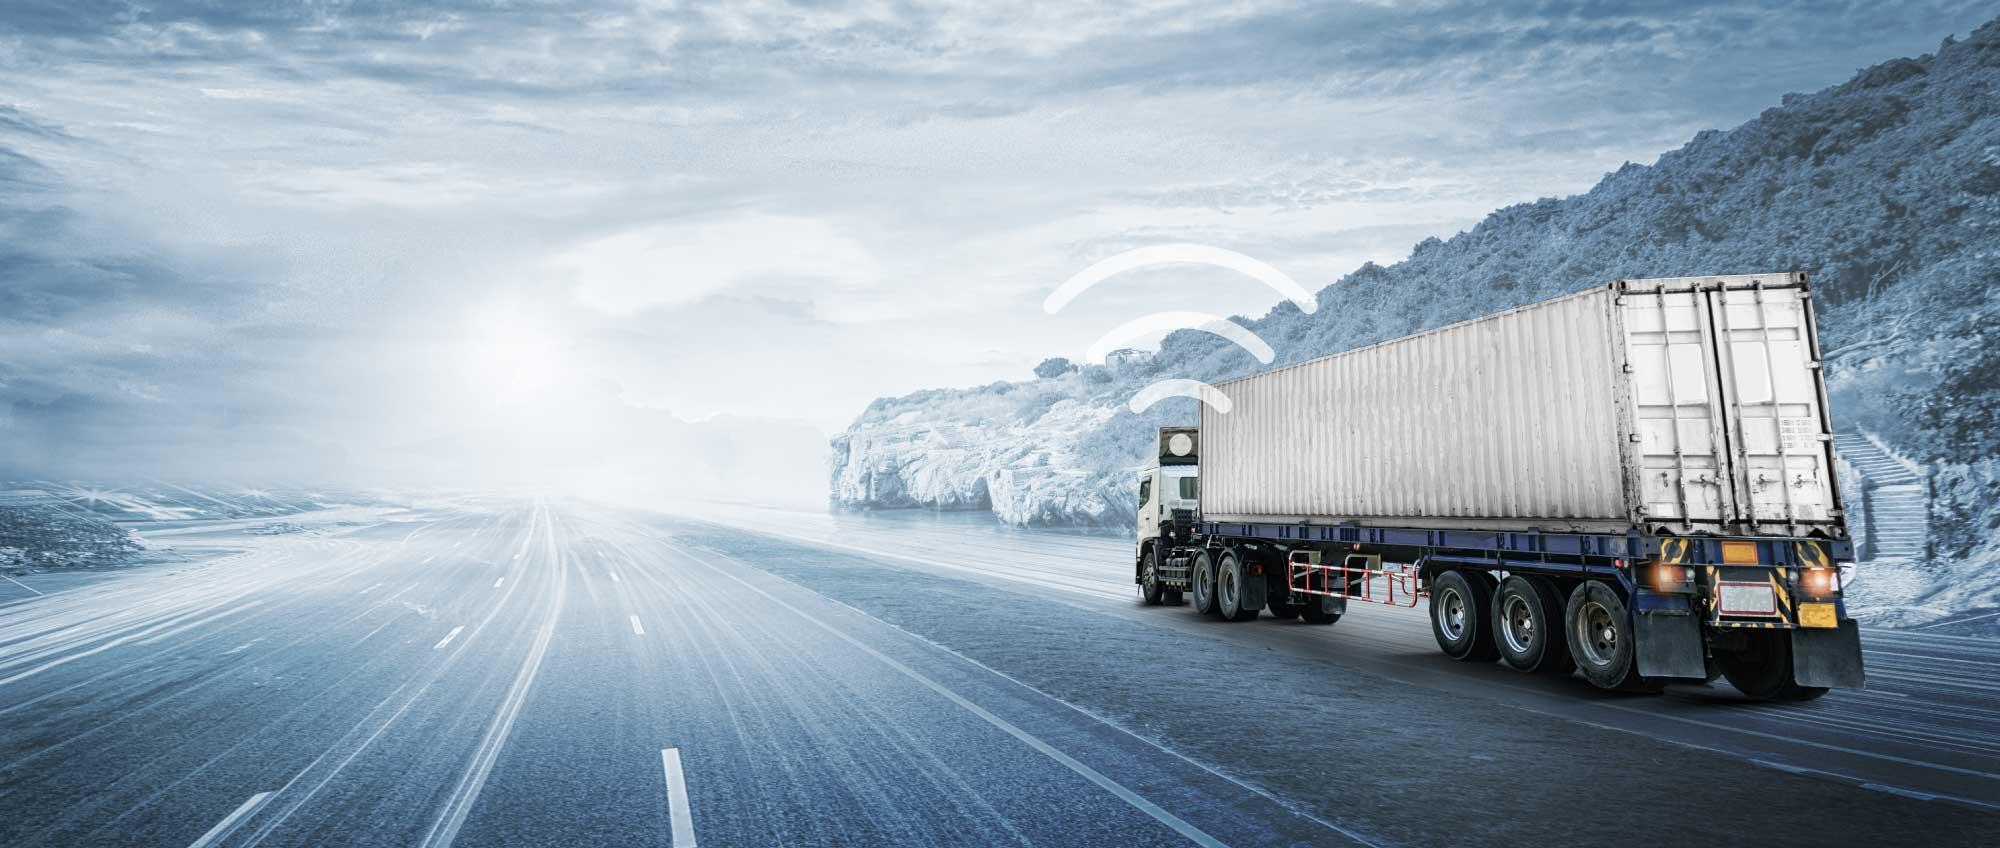 Land-Mobile Vehicle Tracking